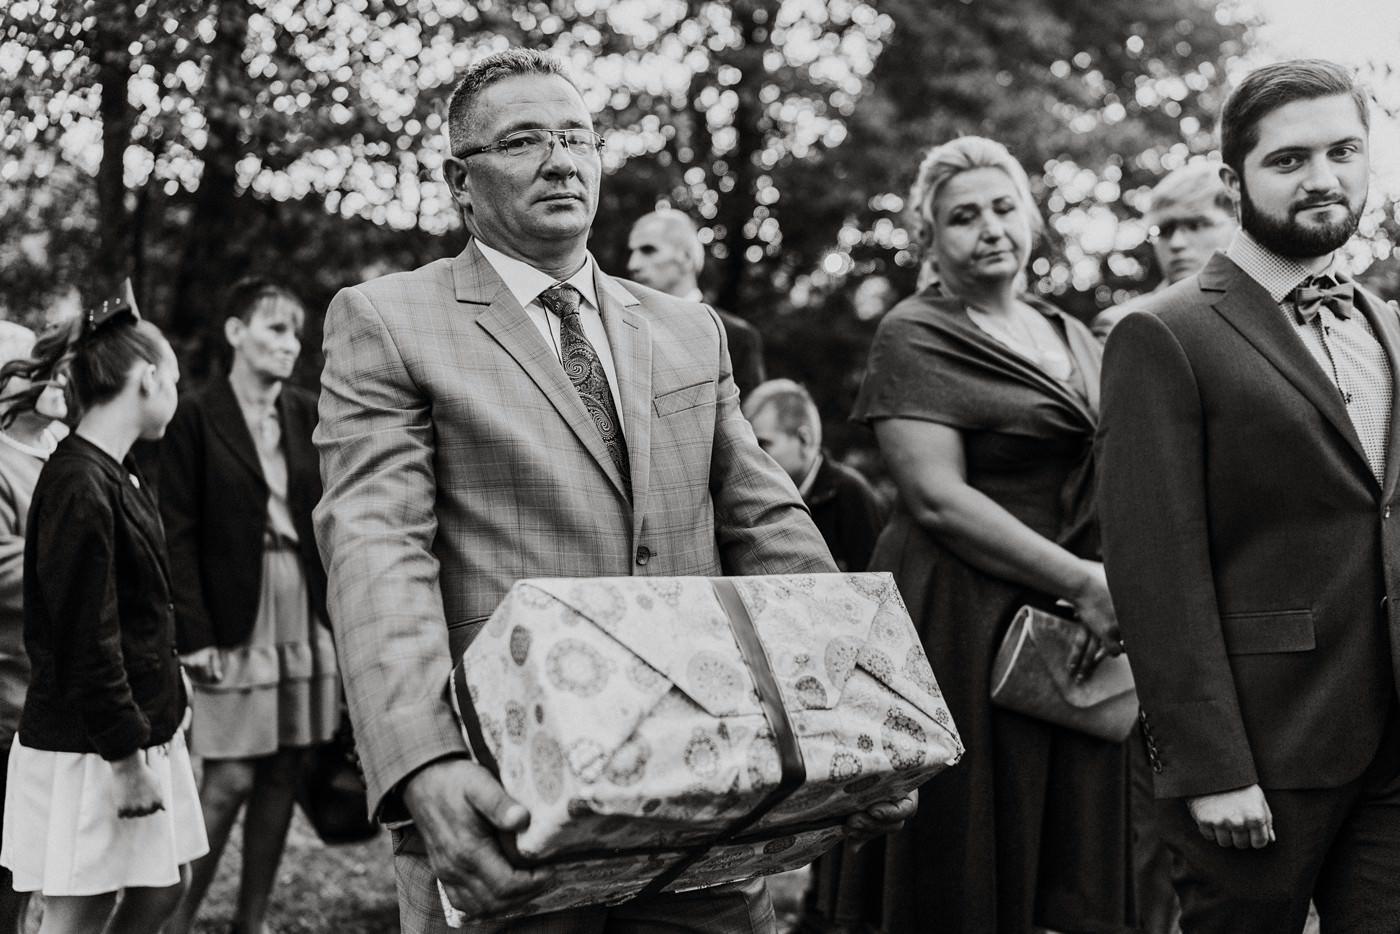 Martyna & Bartek - Wesele w Górach Sowich 56